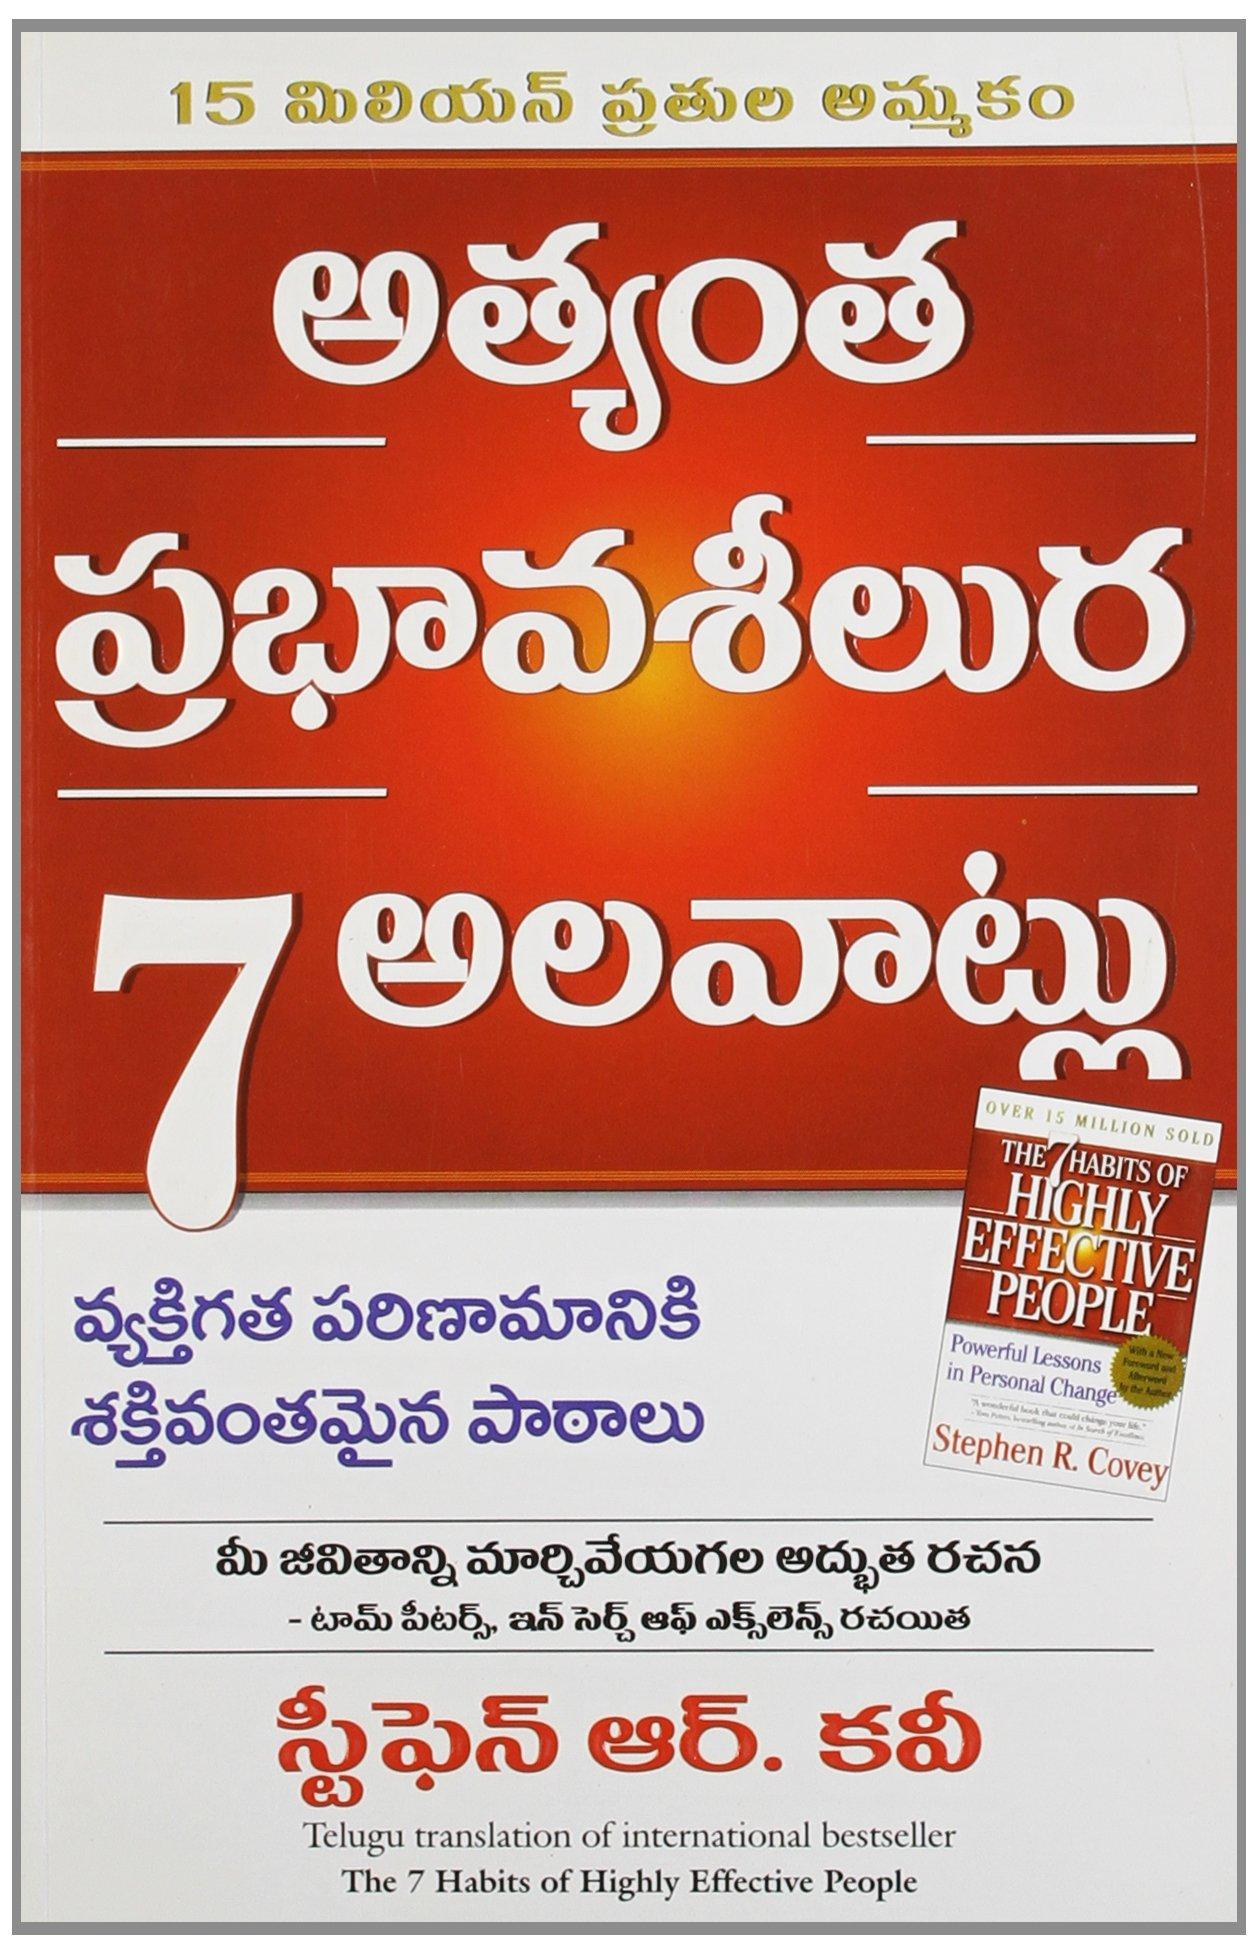 THE 7 HABITS OF HIGHLY EFFECTIVE PEOPLE - Telugu